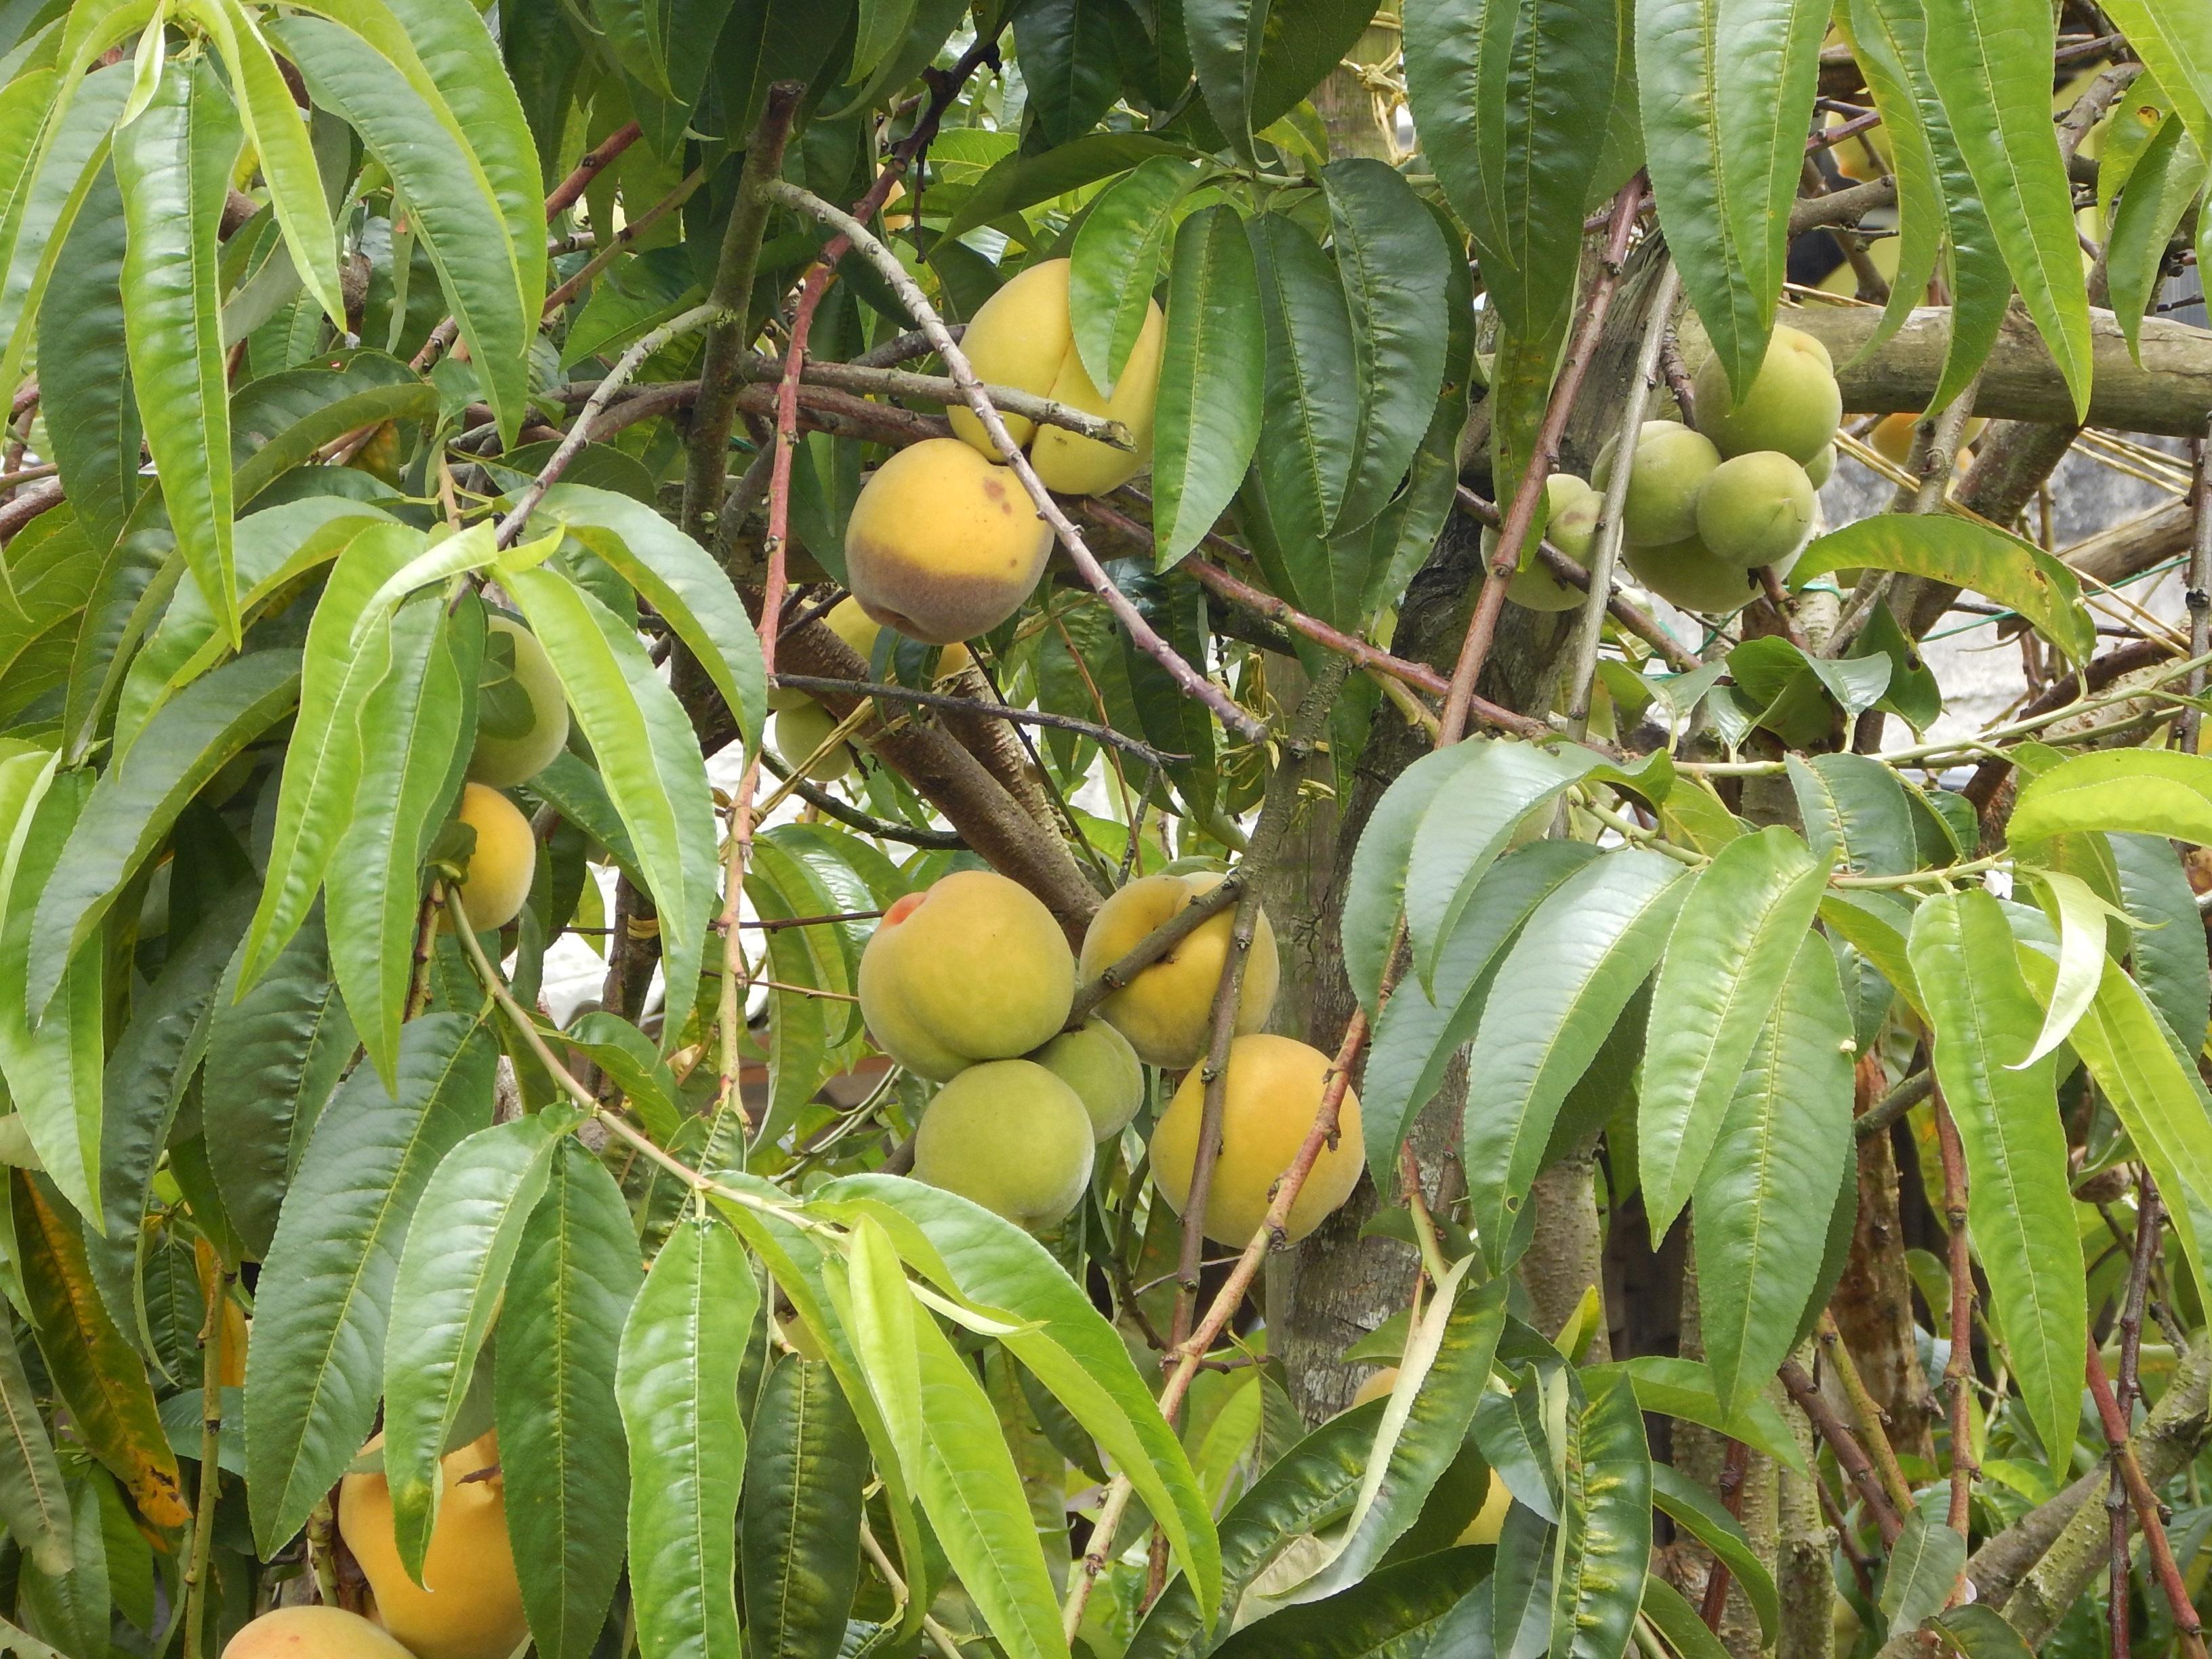 fotos gratis rbol fruta flor salvaje comida